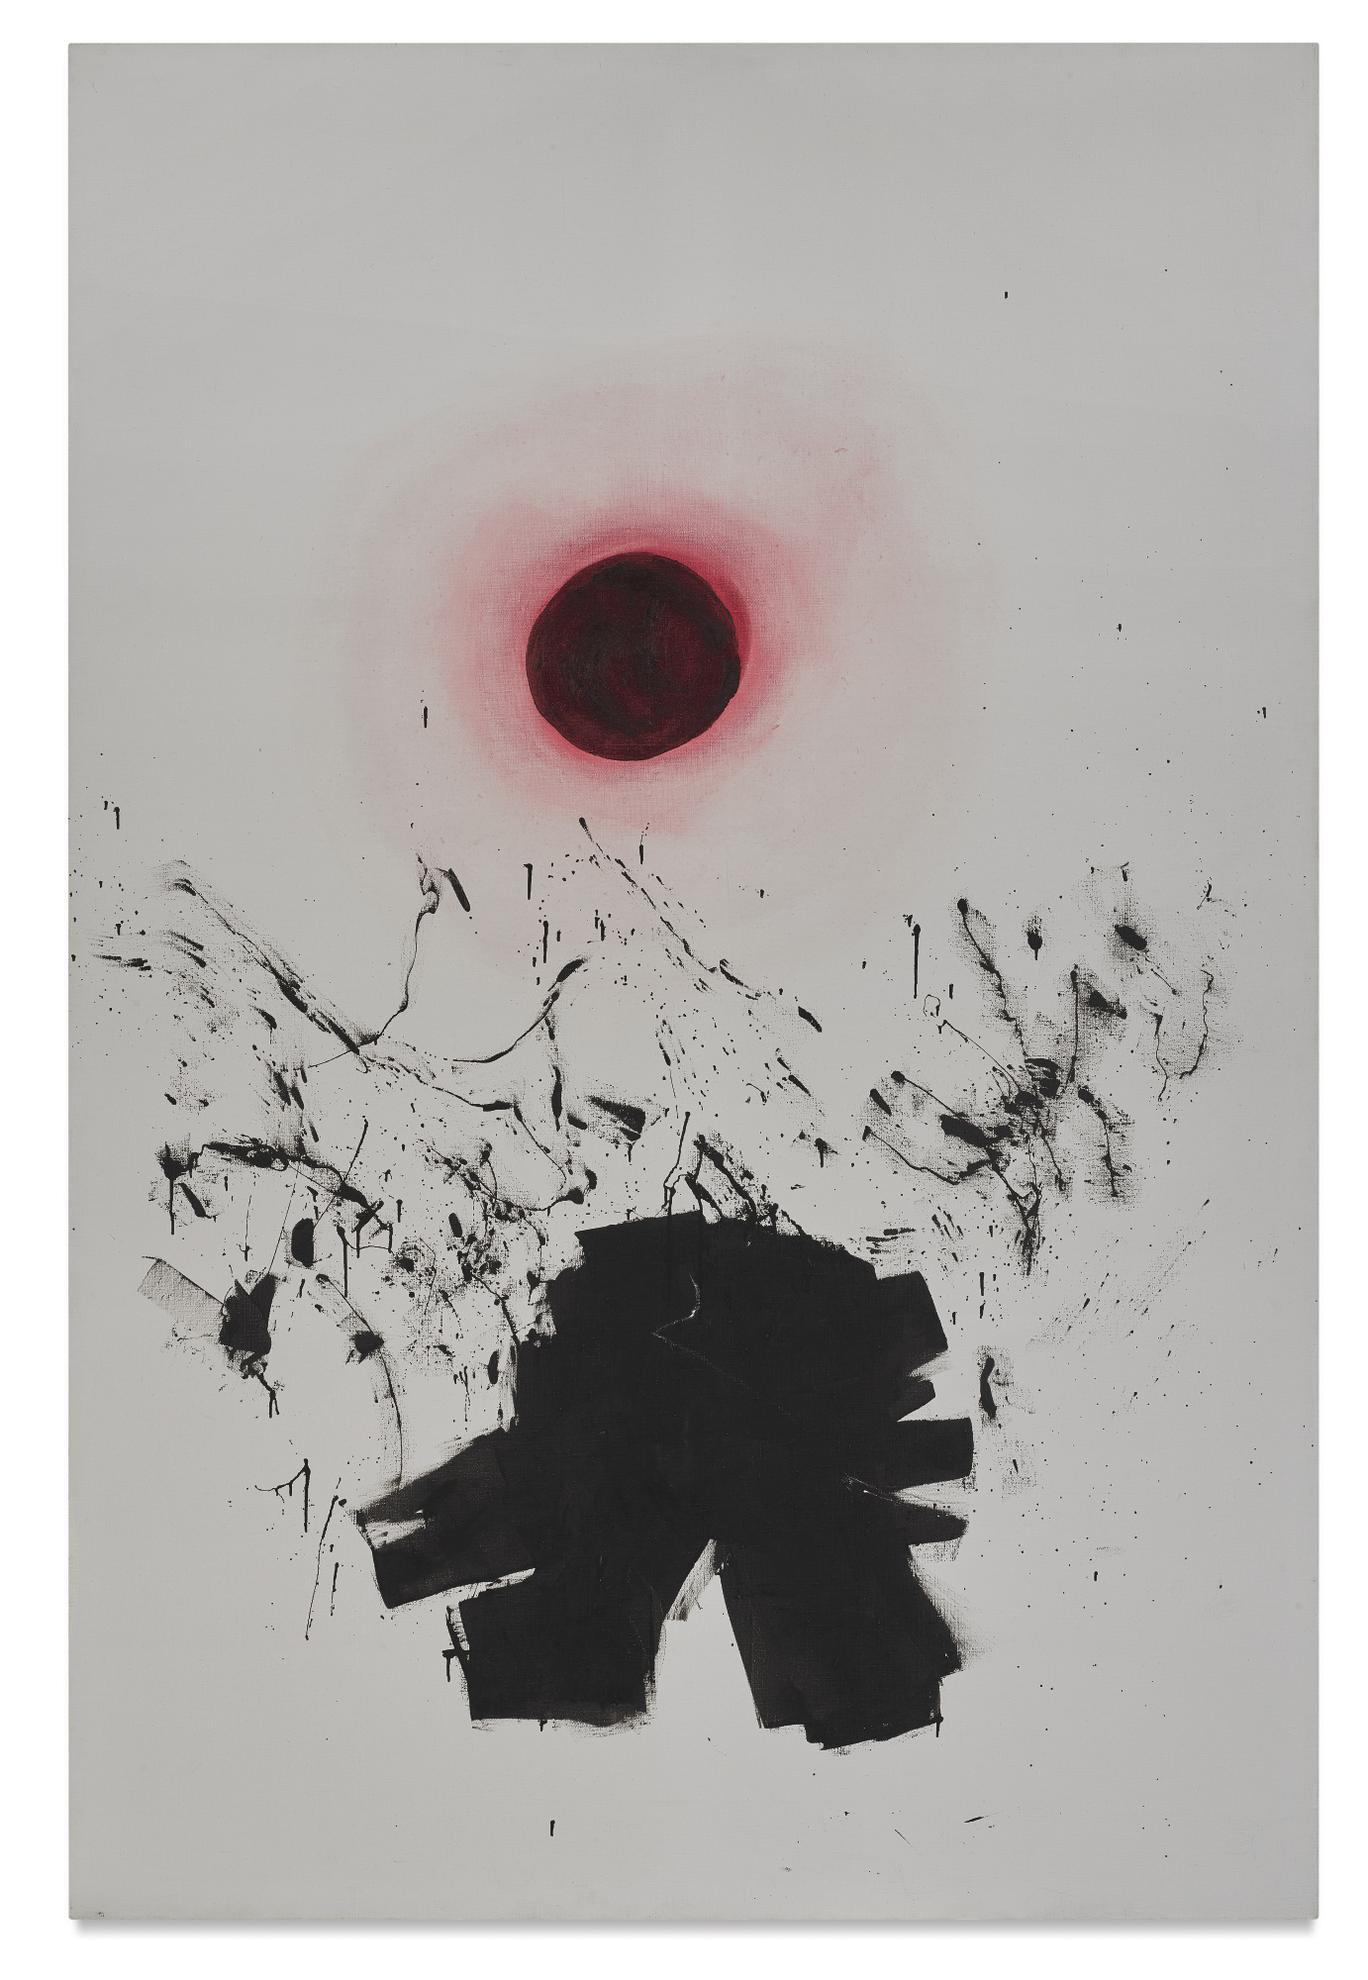 Adolph Gottlieb-Burst II-1972